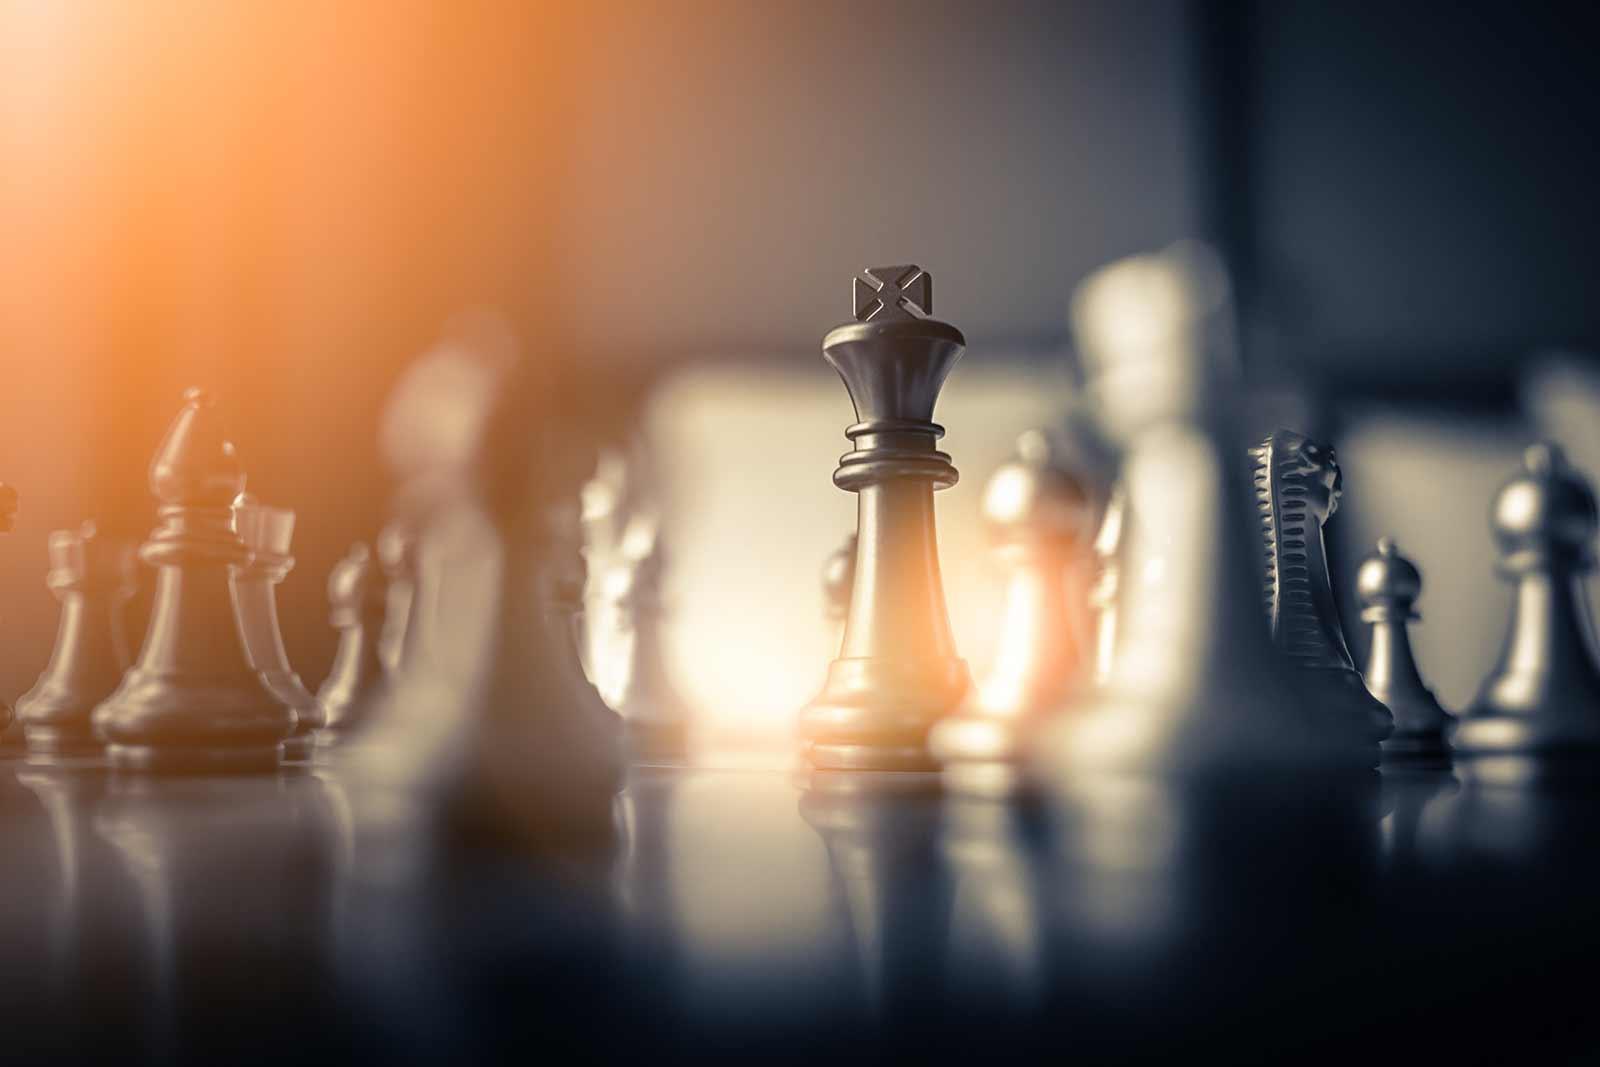 Fotografia ilustrativa de um tabuleiro de xadrez